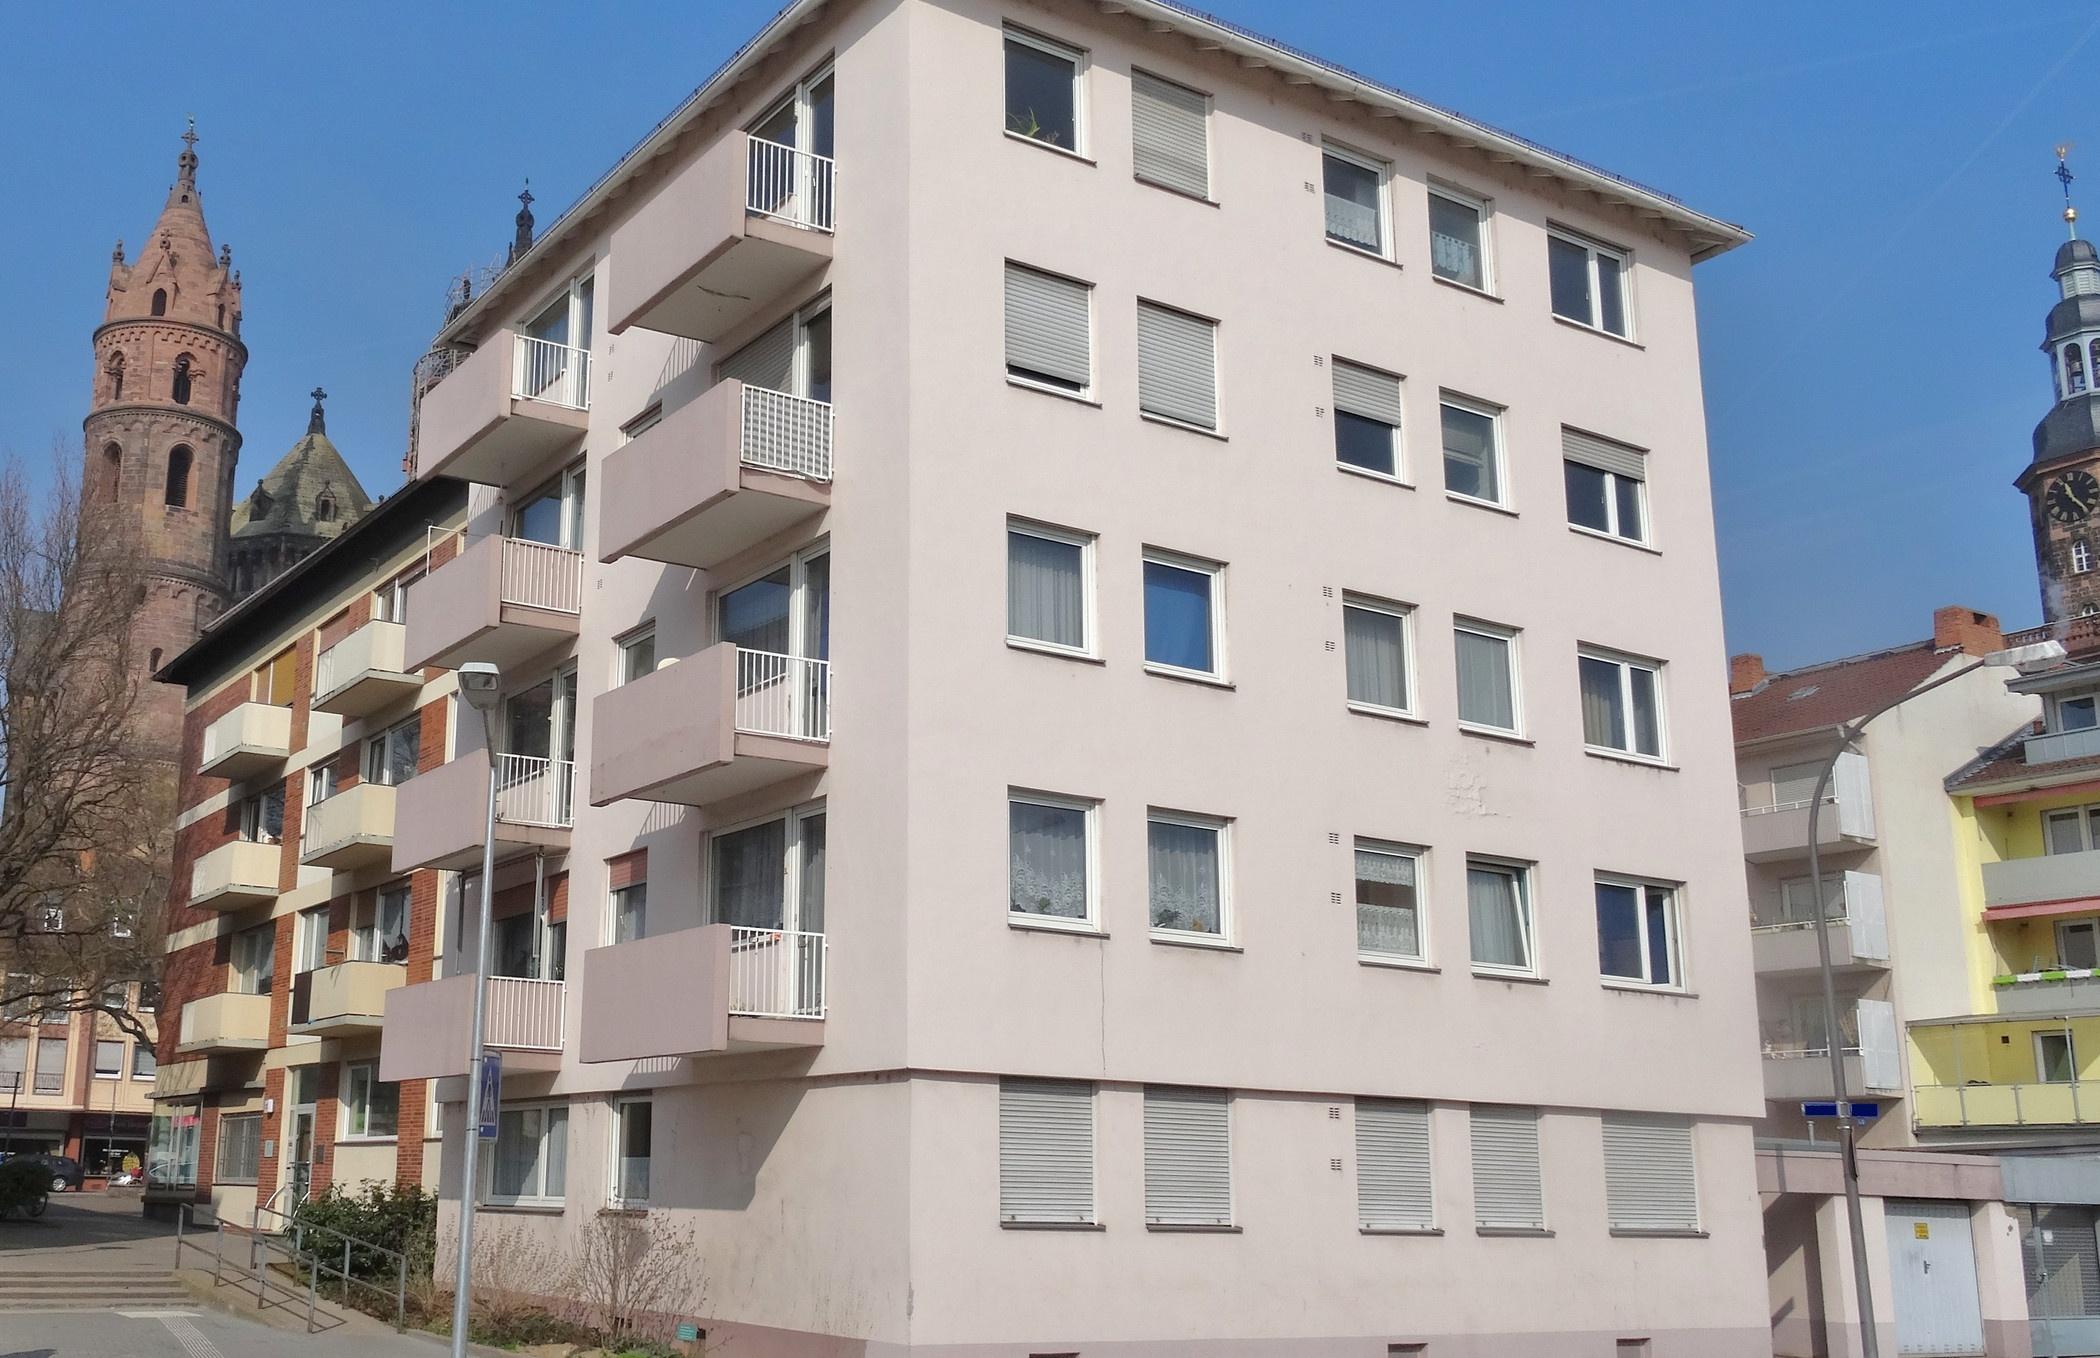 Gelegenheit! Renditeobjekt! Gepflegtes Wohnhaus in Innenstadtlage, 67547 Worms, Mehrfamilienhaus